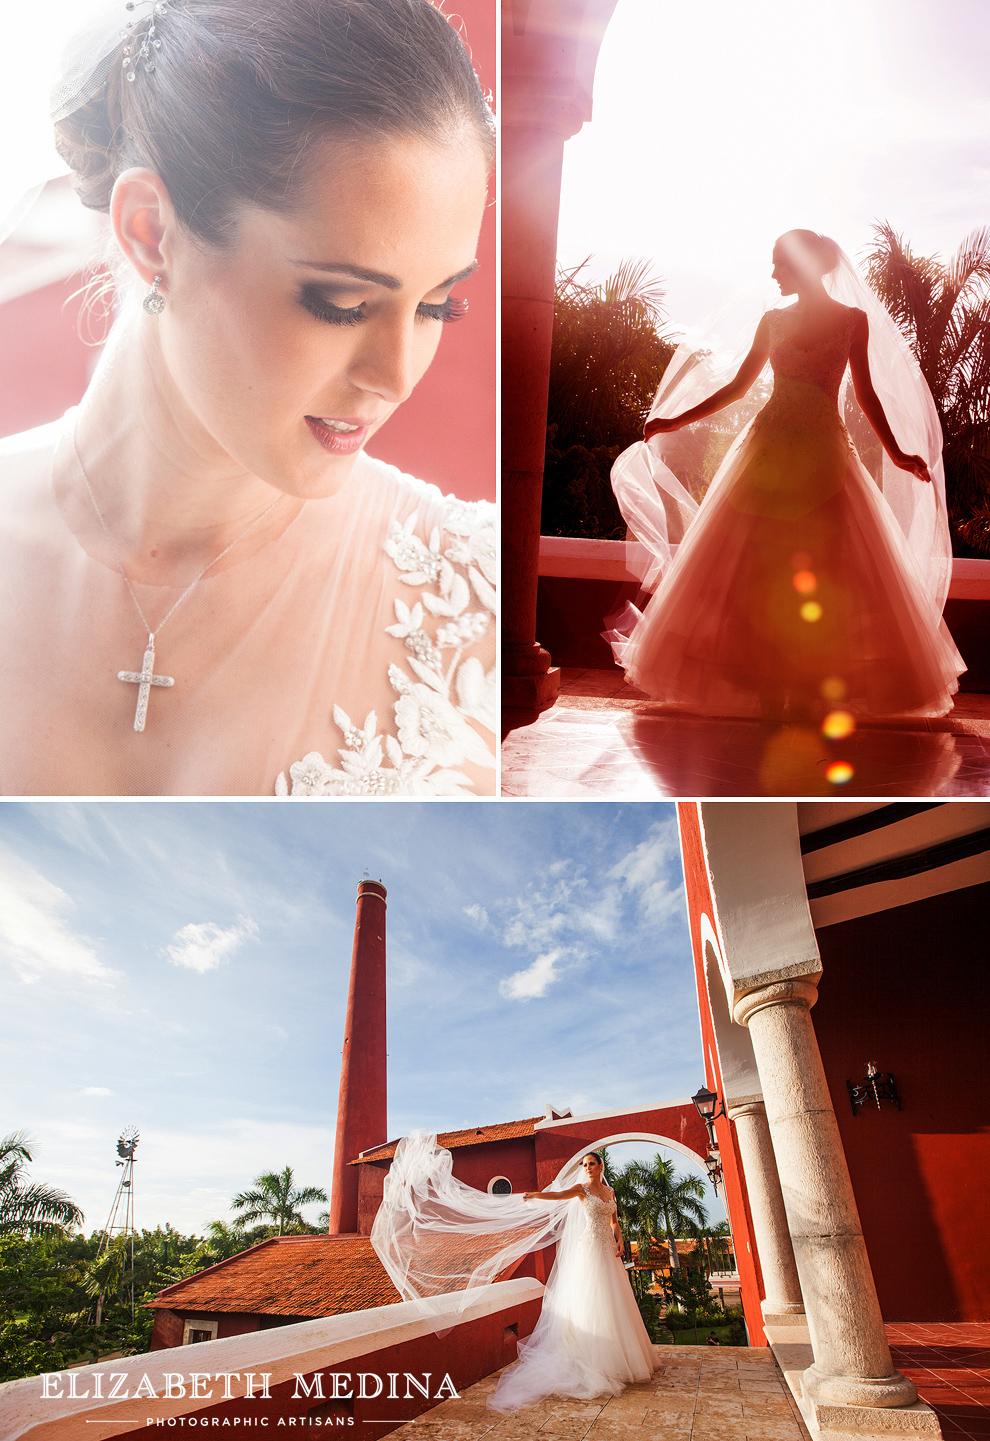 elizabeth_medina_merida_photographer_813_007 Lula and Daniel, Hacienda San Diego Cutz Wedding